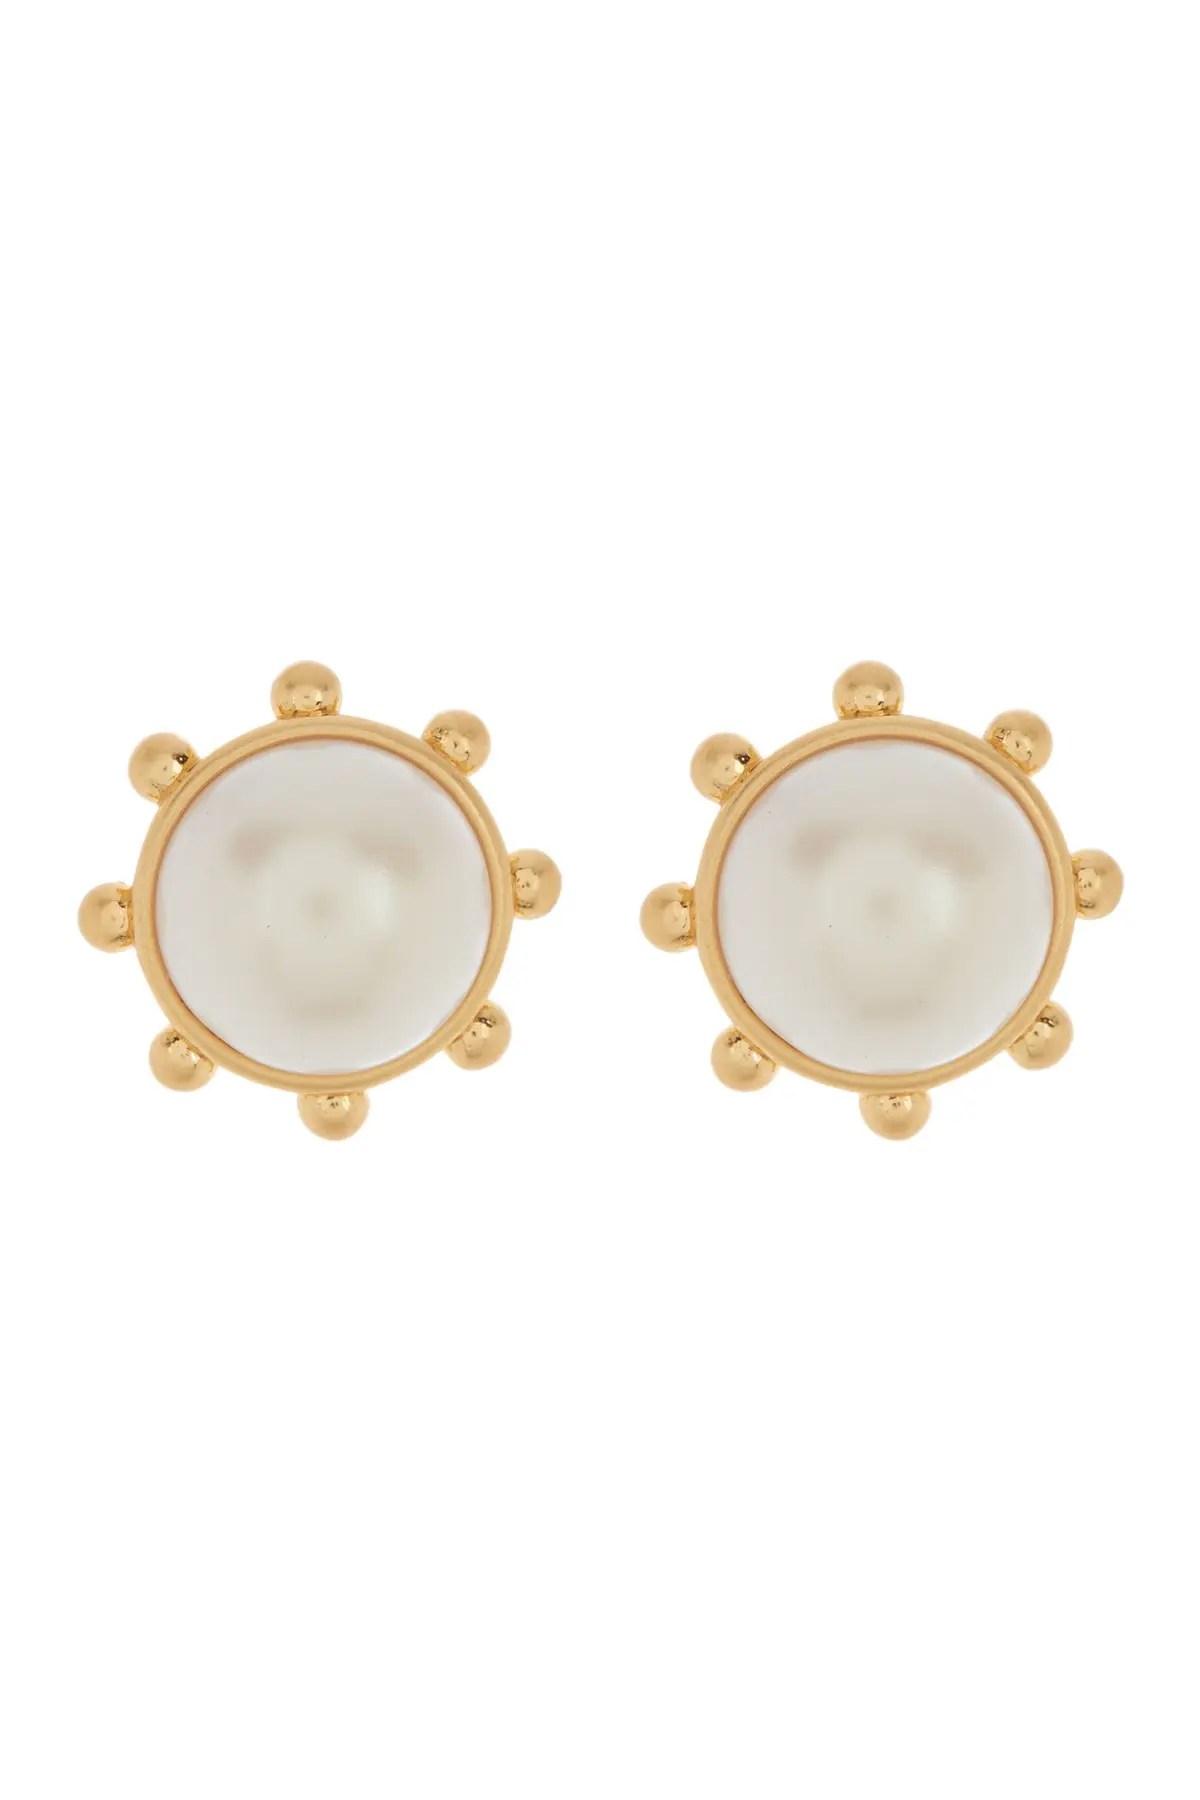 kate spade new york gold tone bezel set initation pearl stud earrings nordstrom rack